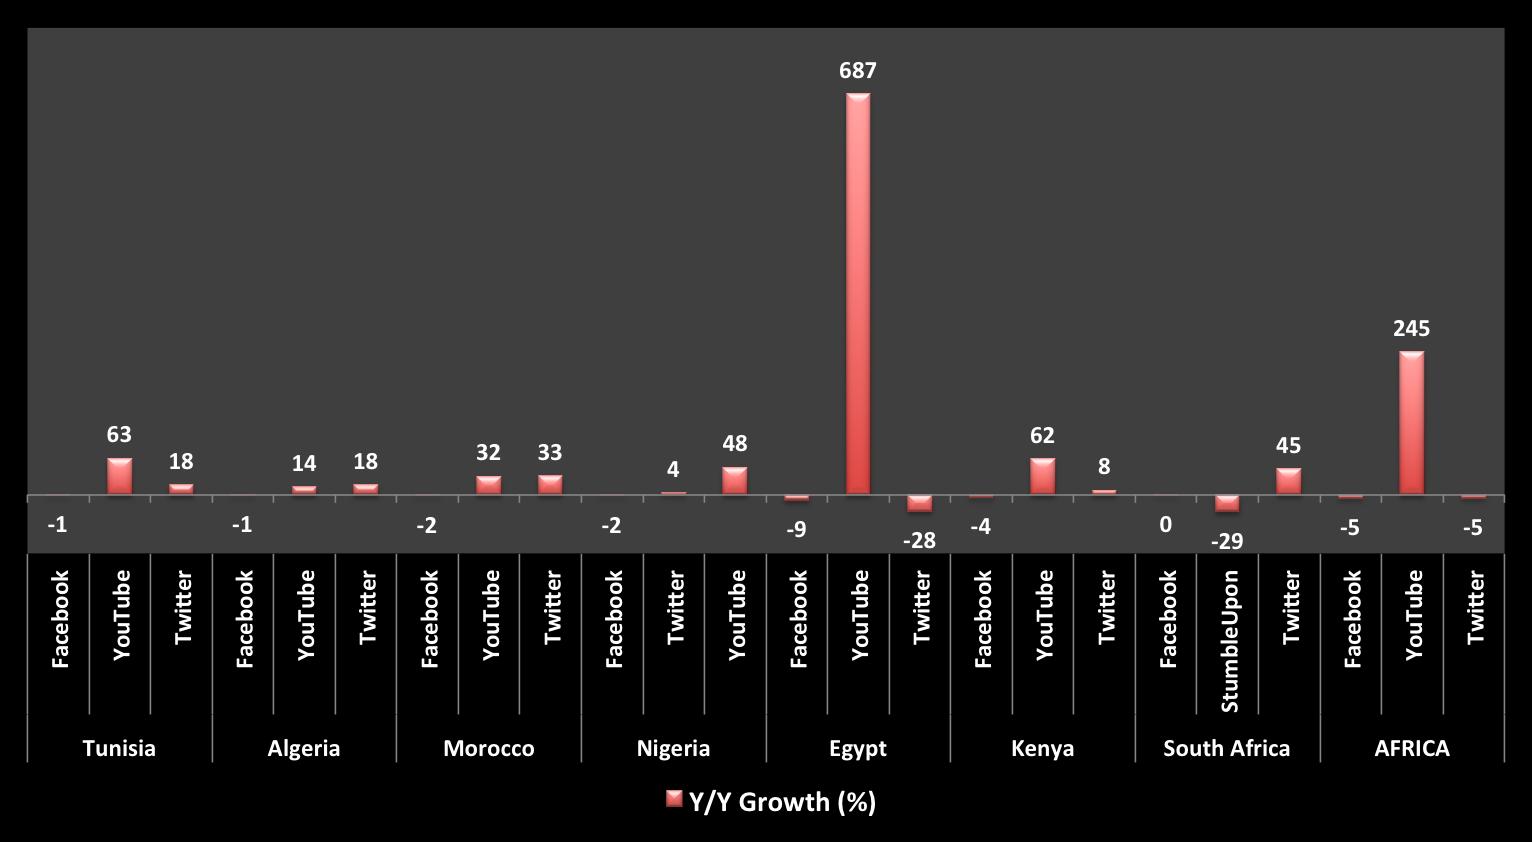 Year_on_Year Growths